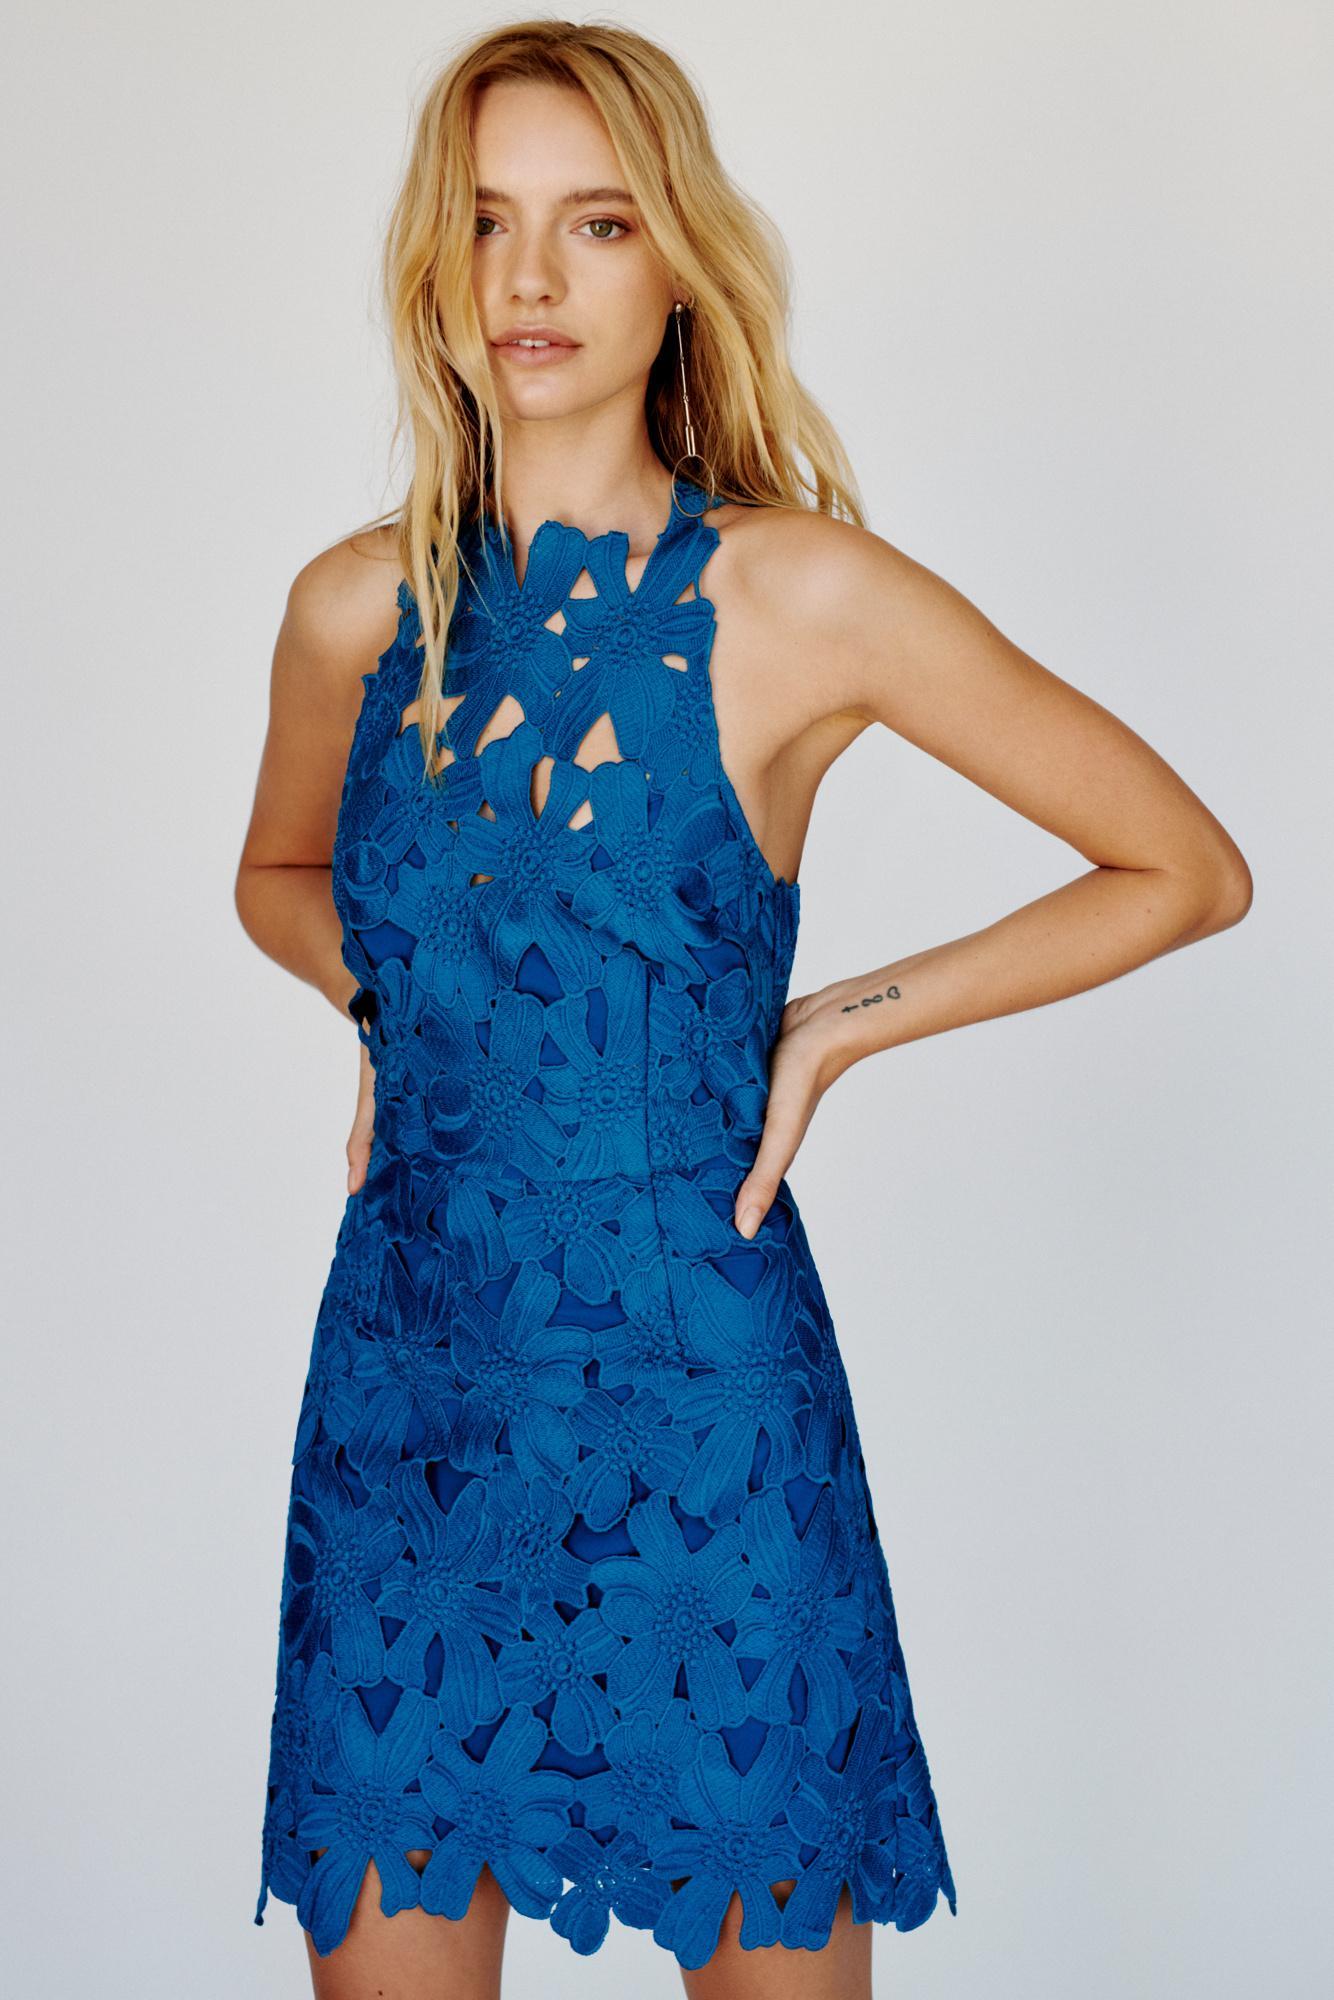 faf5a10a0e Free People - Blue Jessa Lace Mini Dress By Saylor - Lyst. View fullscreen